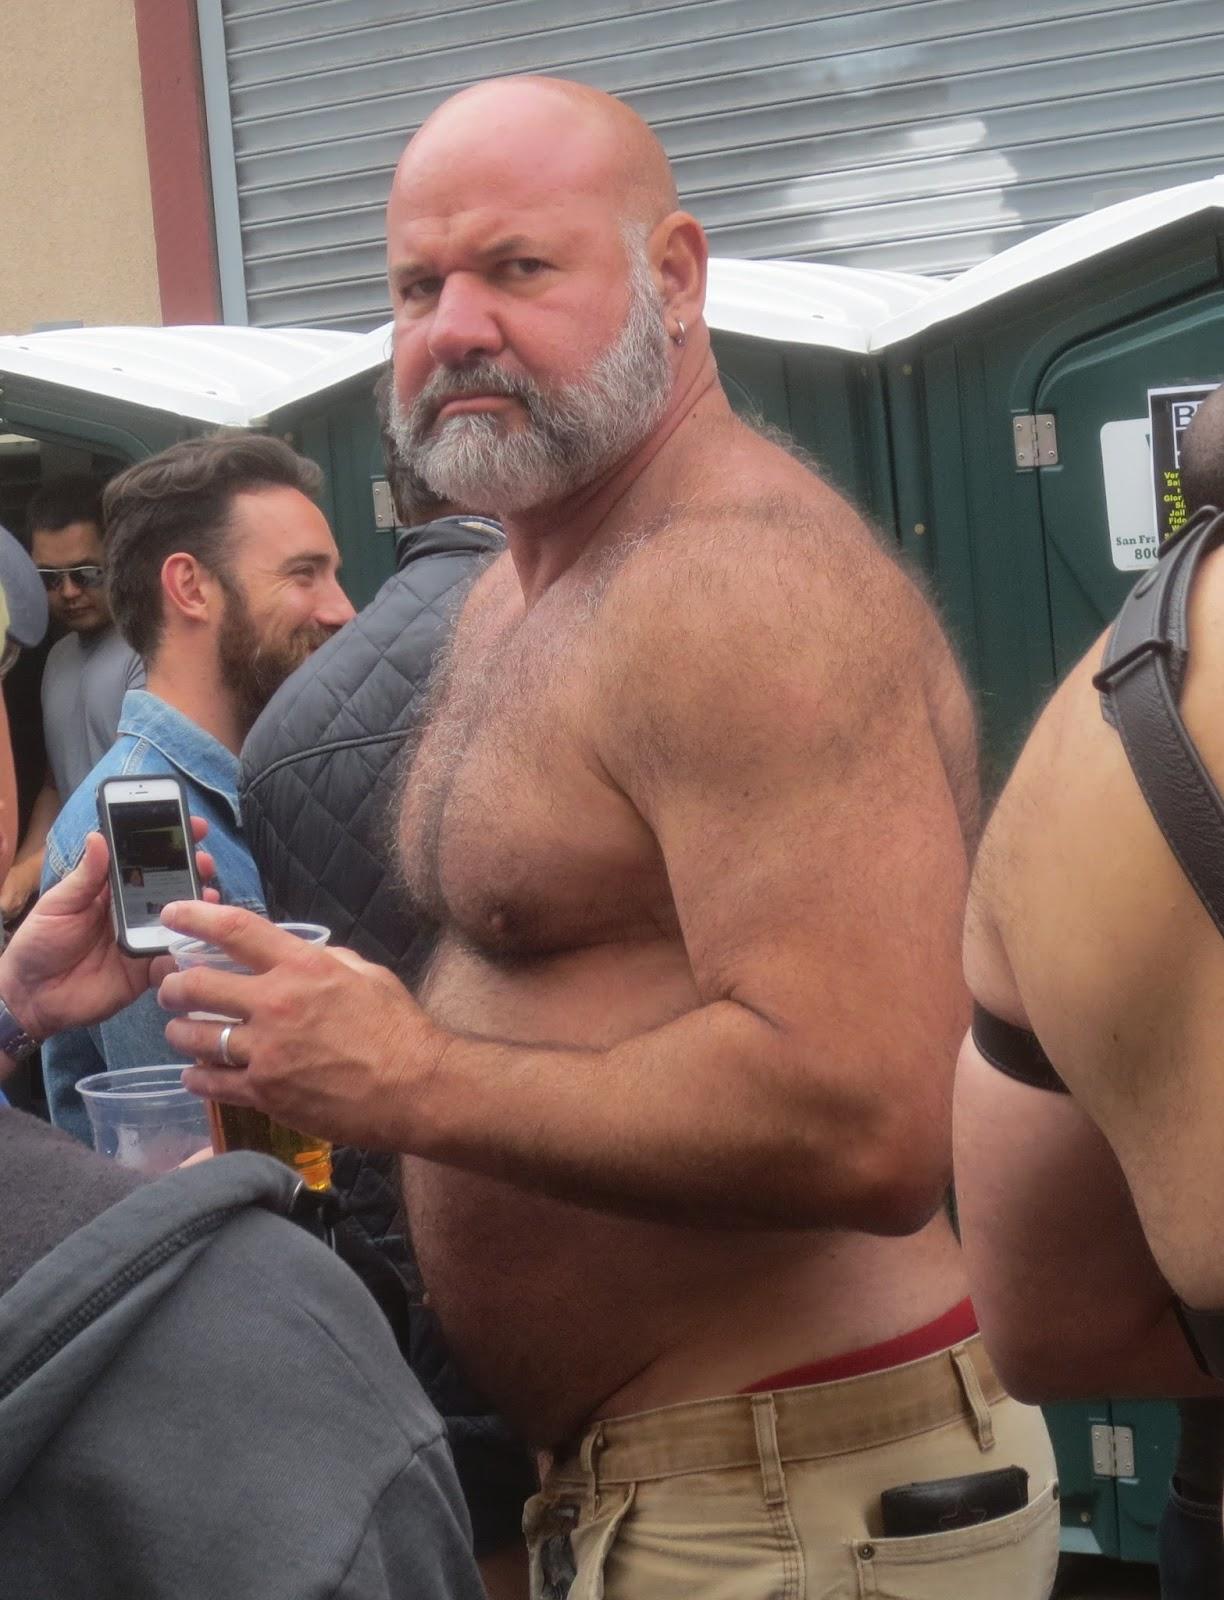 Pierre froide steve austin gay